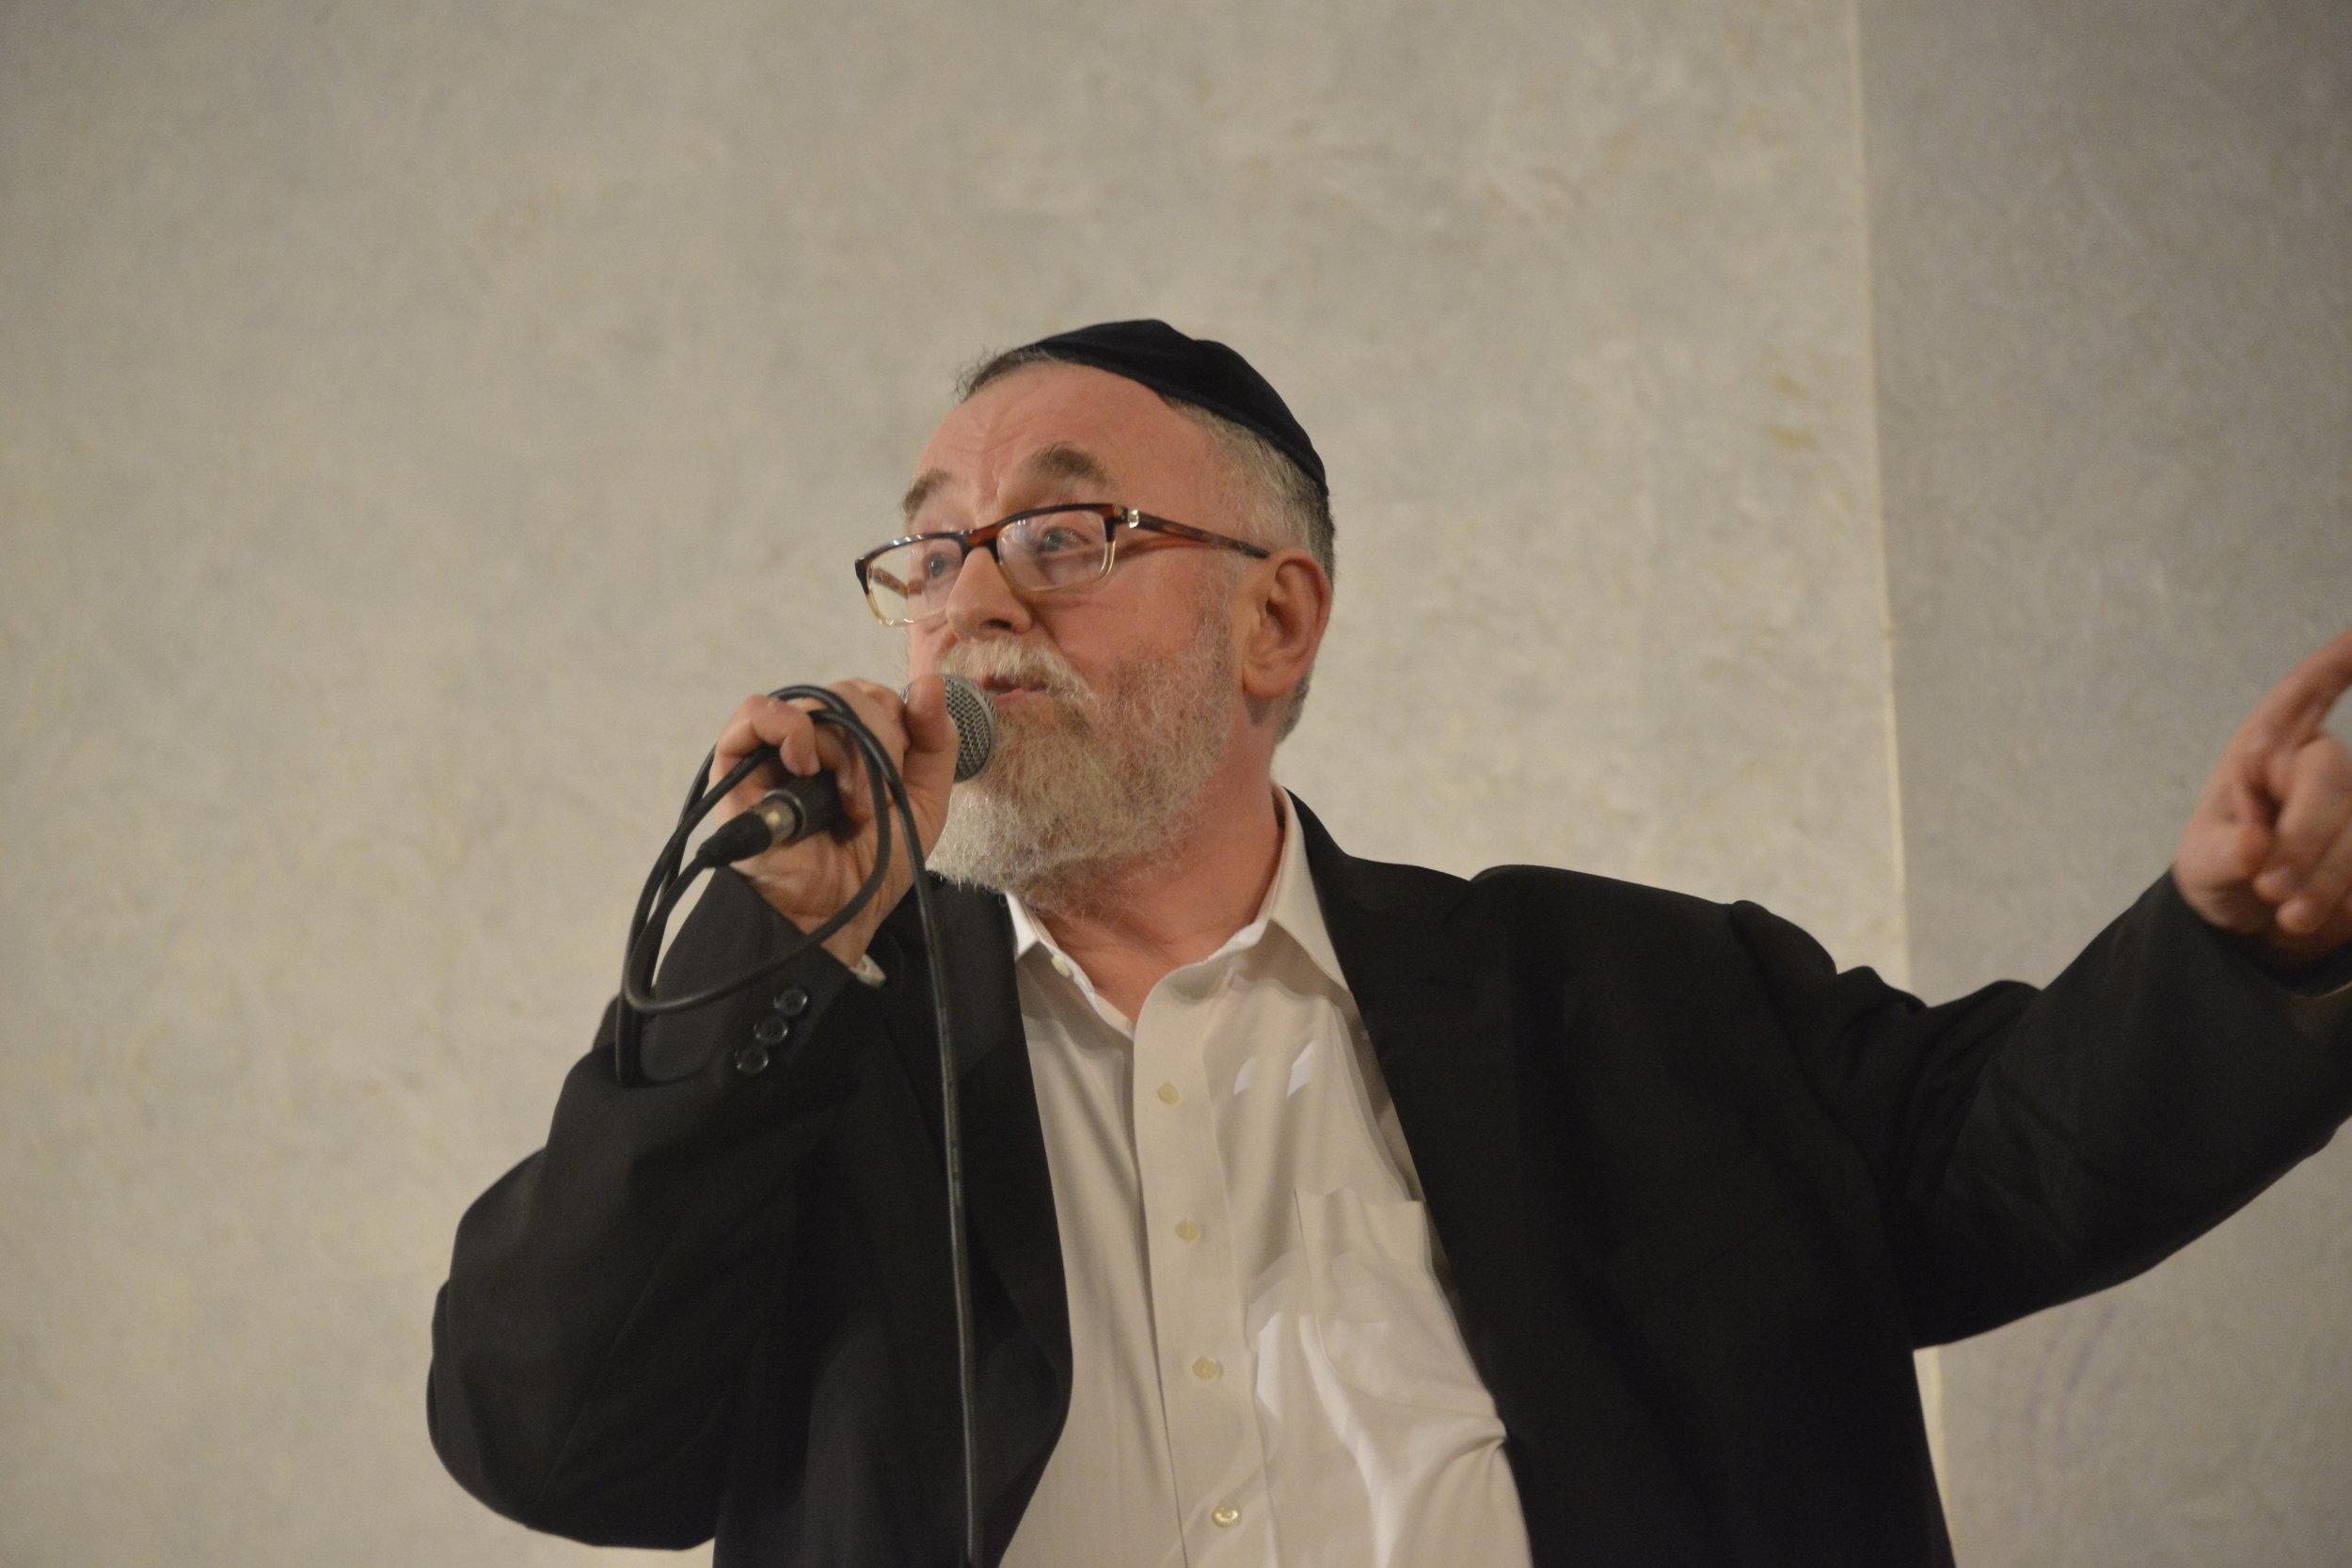 kultur 2014-800 32 tel Aviv 234.jpg